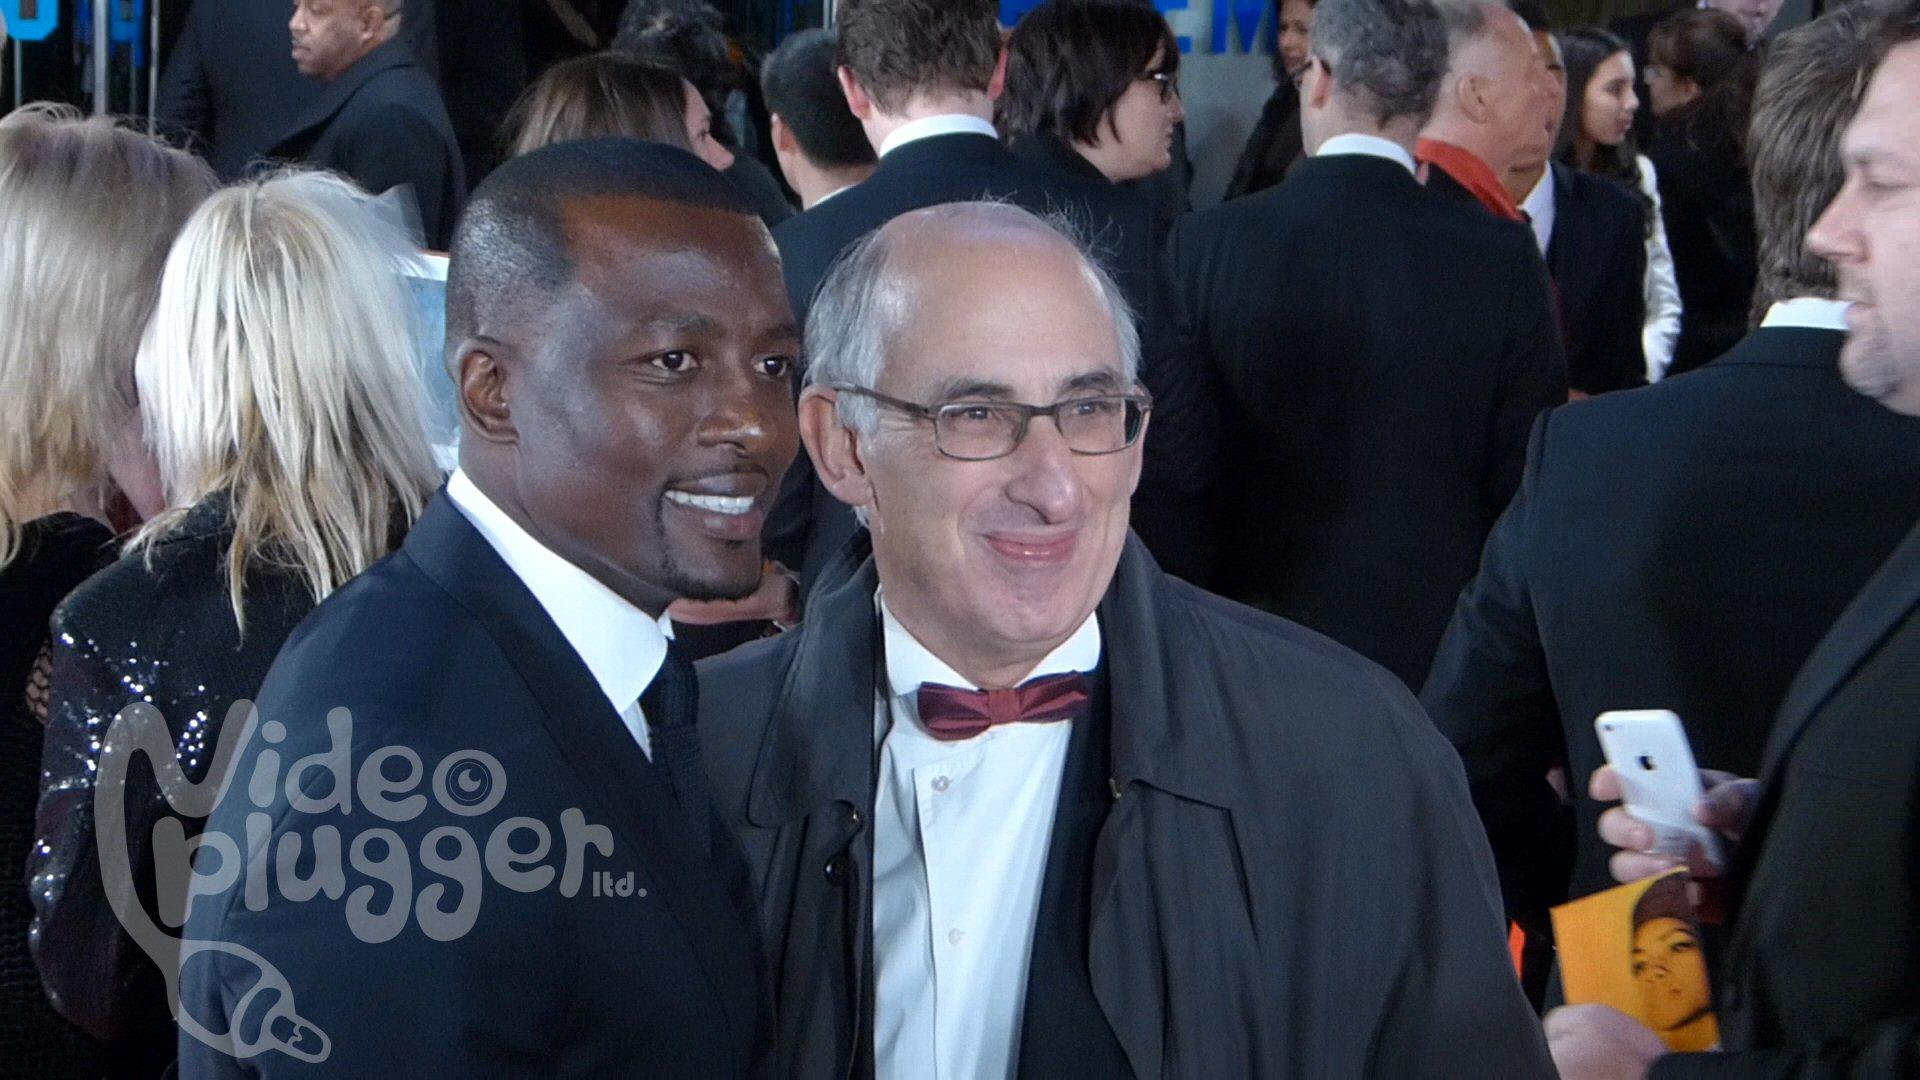 Idris Elba at long walk to freedom premiere